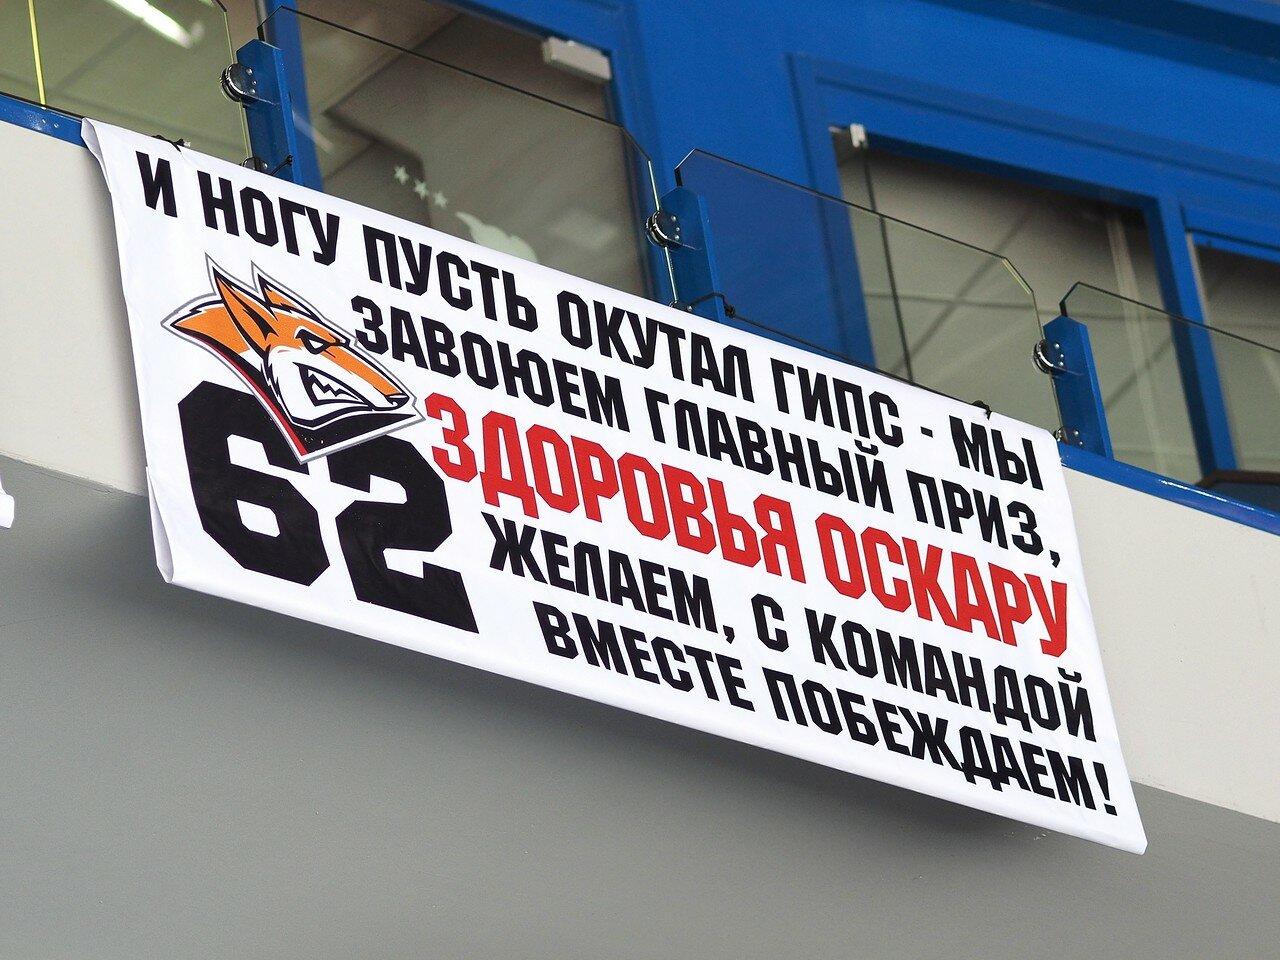 141Восток 1/2 плей-офф Металлург - Сибирь 08.03.2016